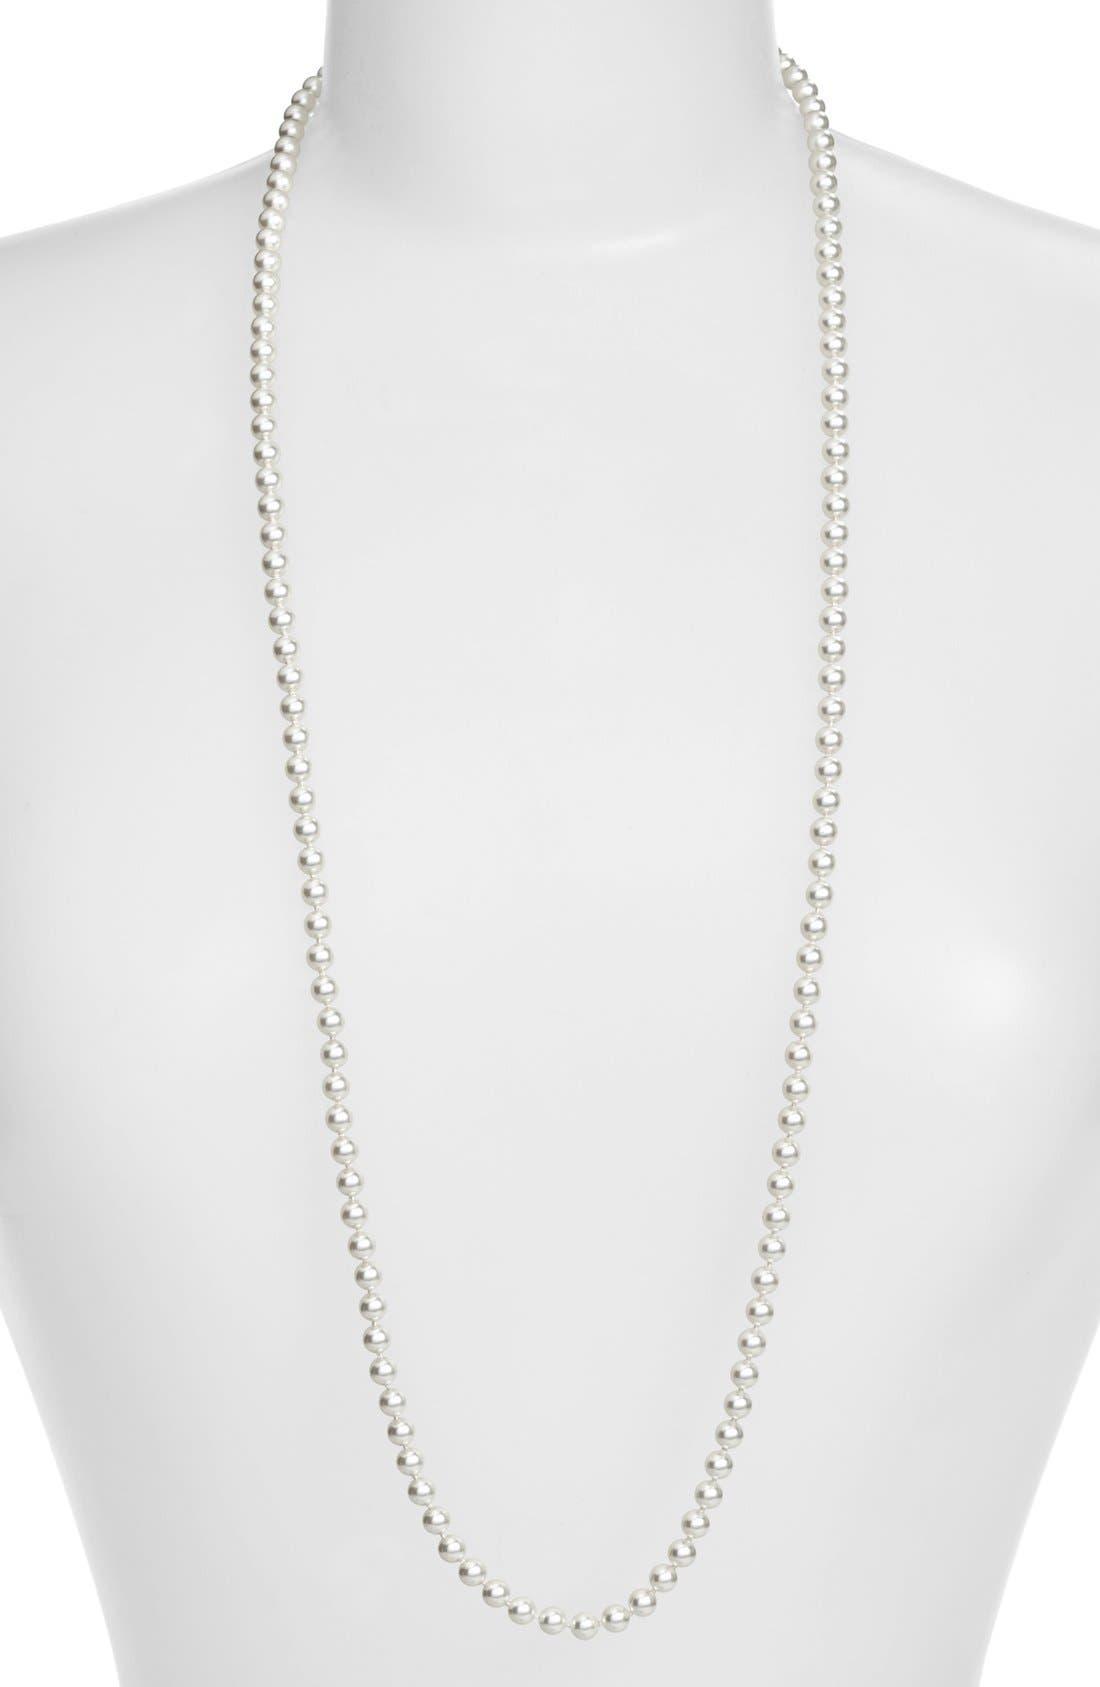 NadriImitation Pearl Long Necklace